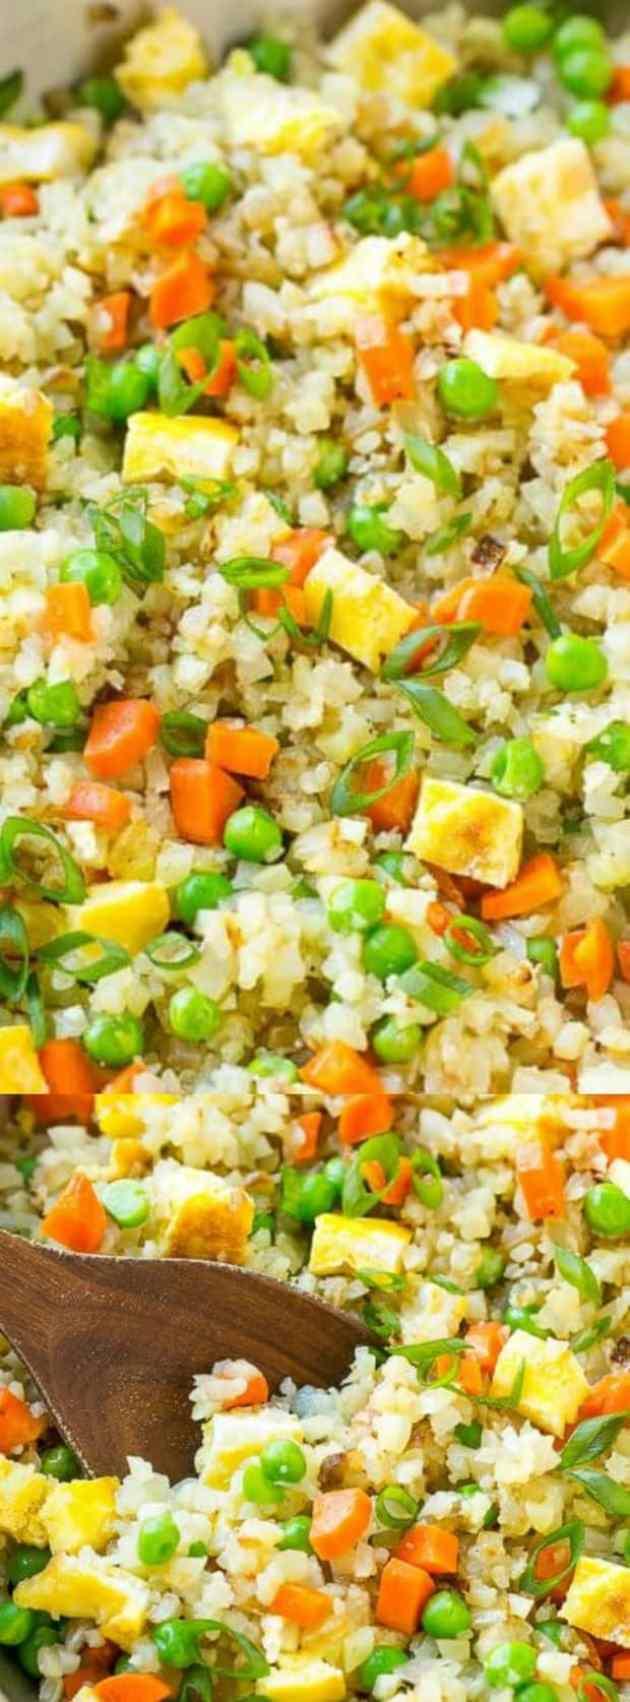 Cauliflower Fried Rice Longpin